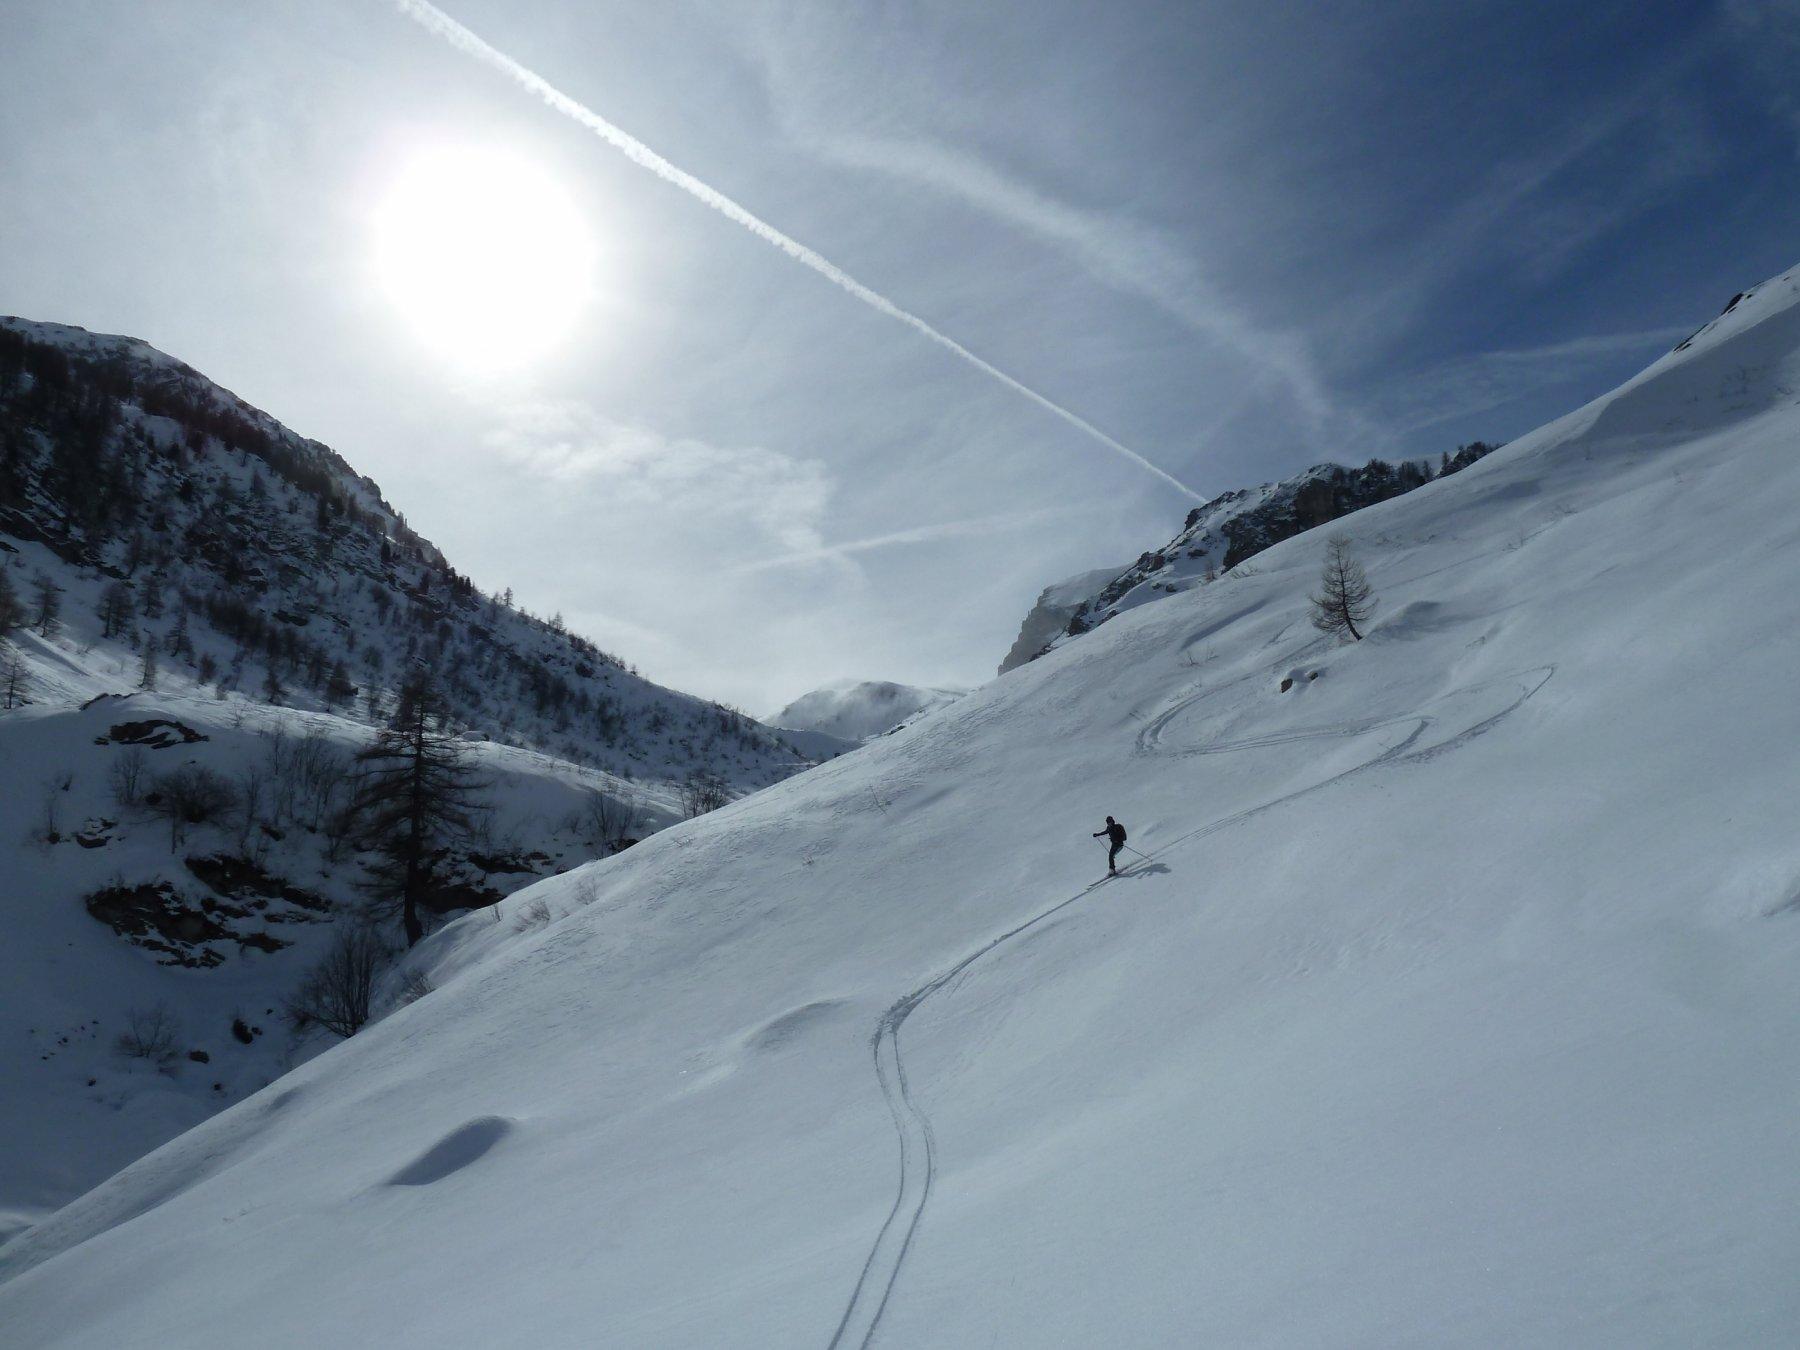 in basso neve ammorbidita dal sole